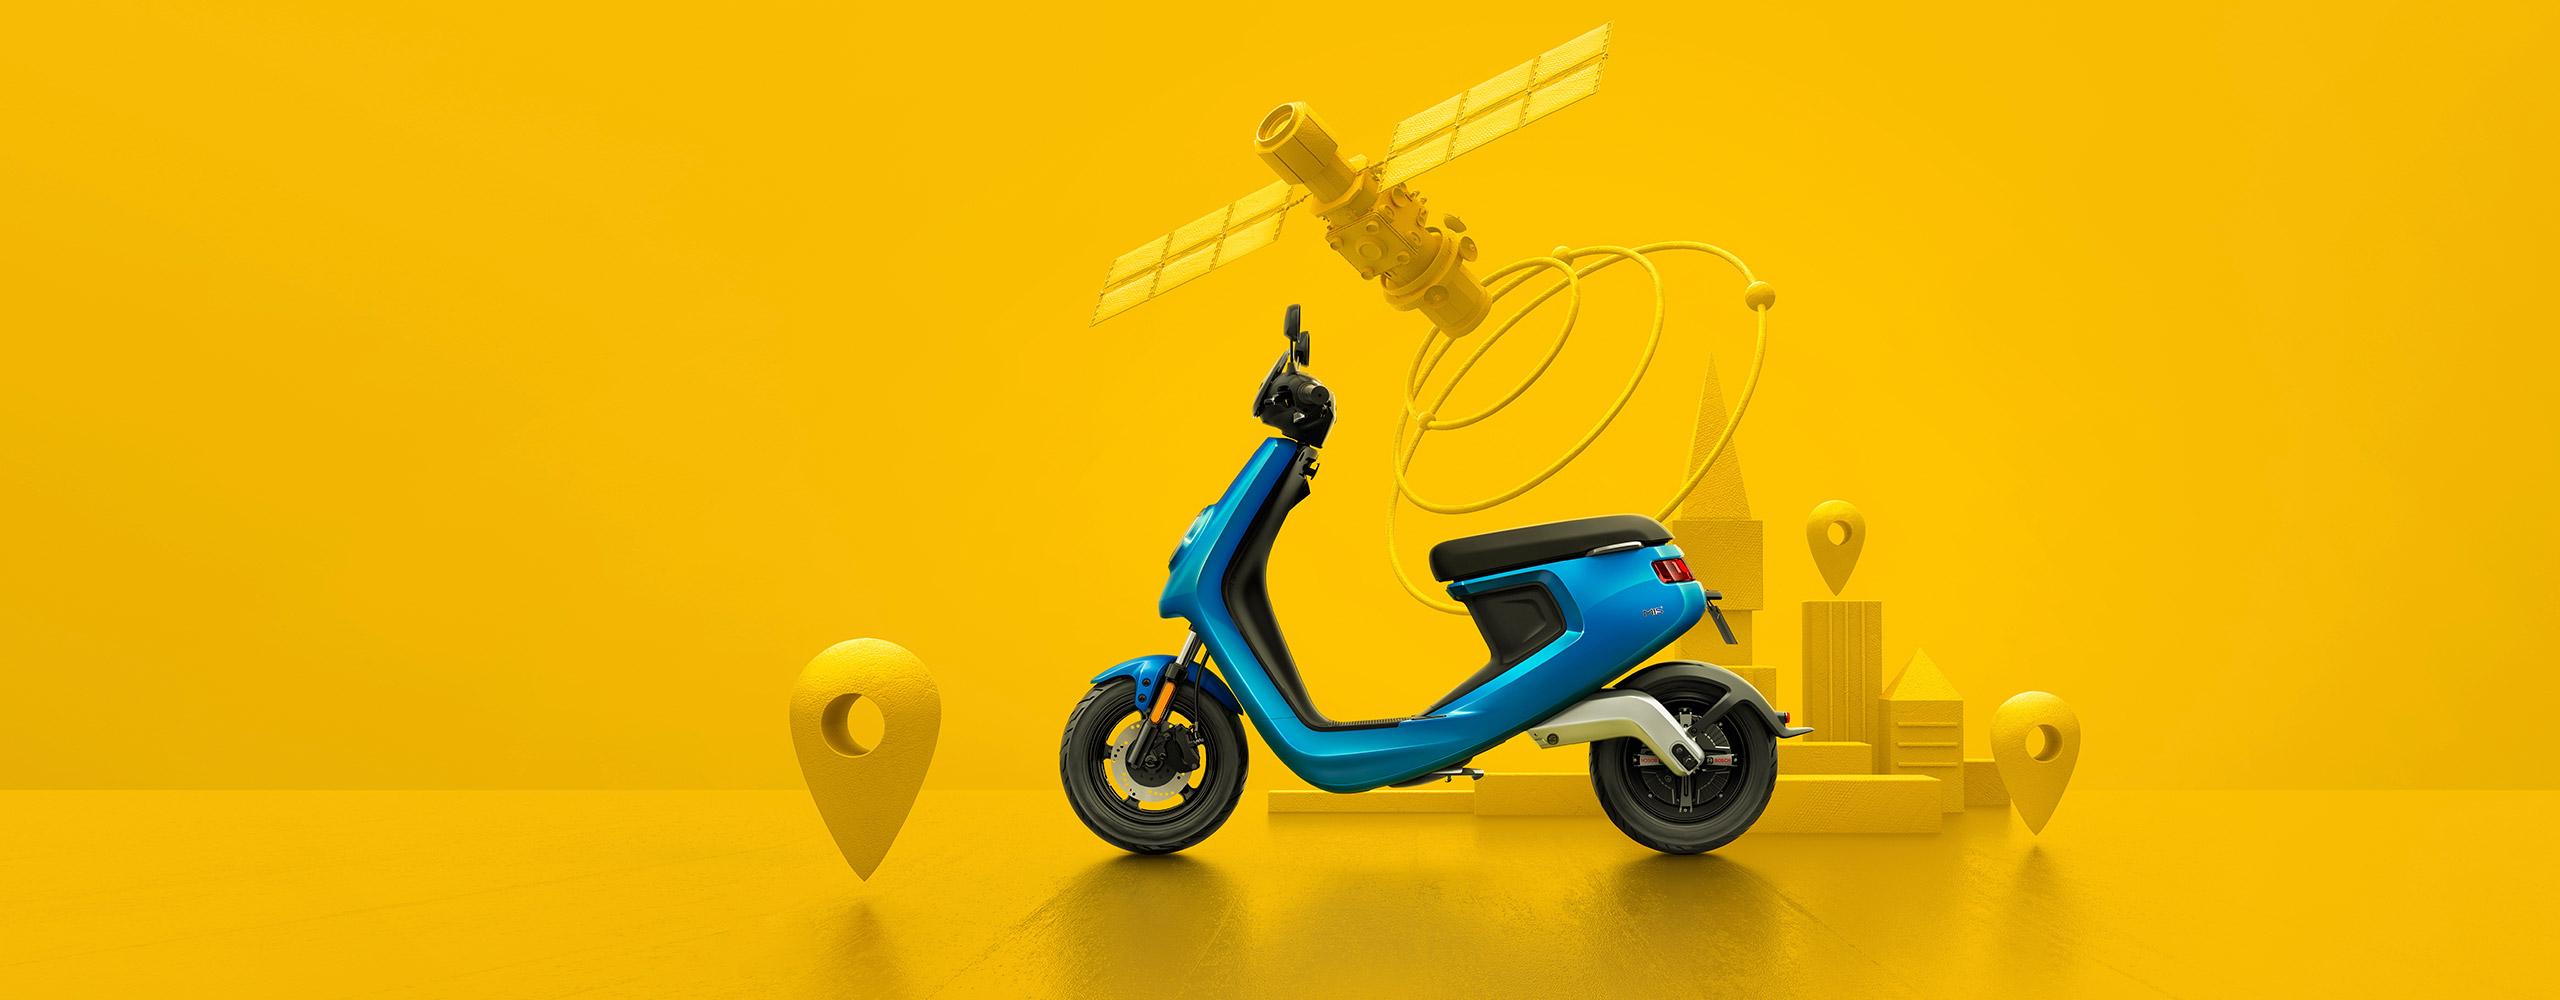 essai scooter electrique pro- niu-paris